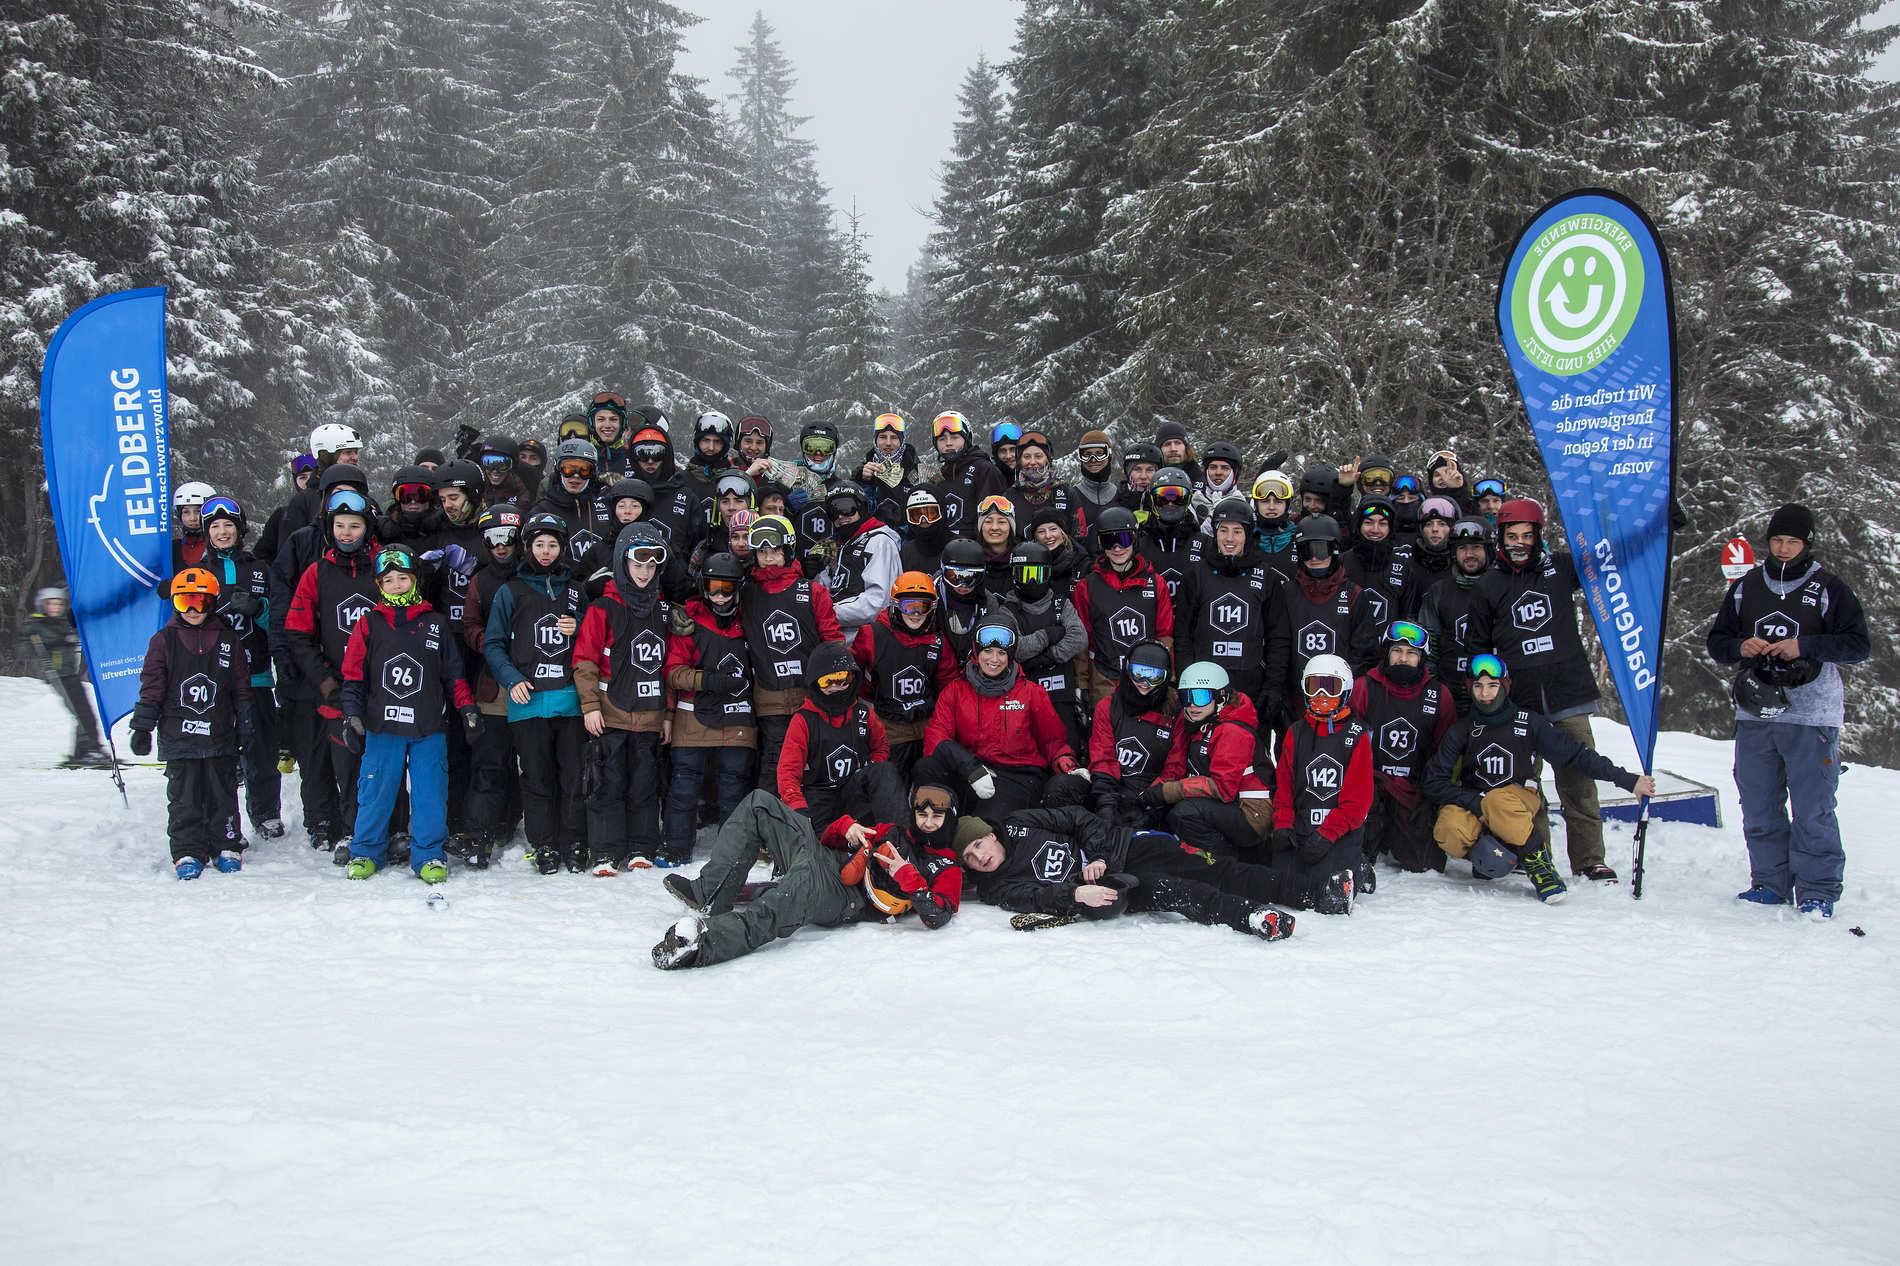 web snowpark feldberg 17 02 2018 lifestyle fs sb martin herrmann qparks 5